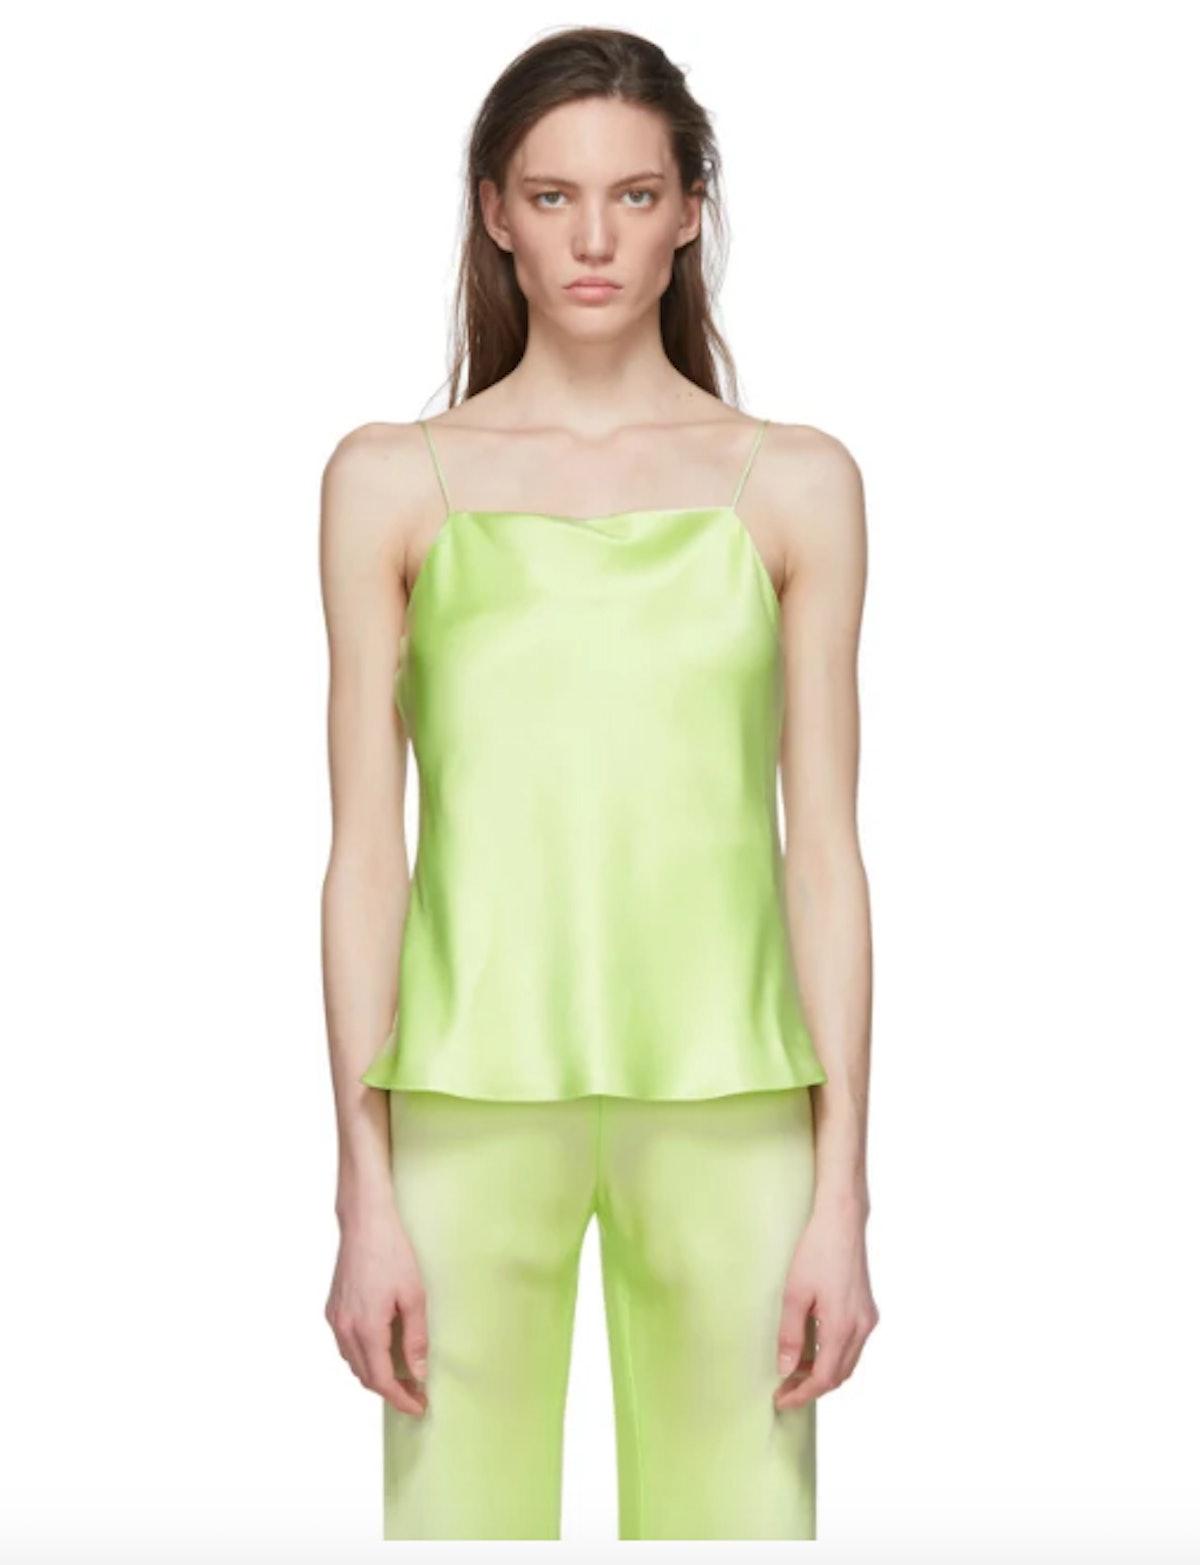 Green Bias Satin Camisole